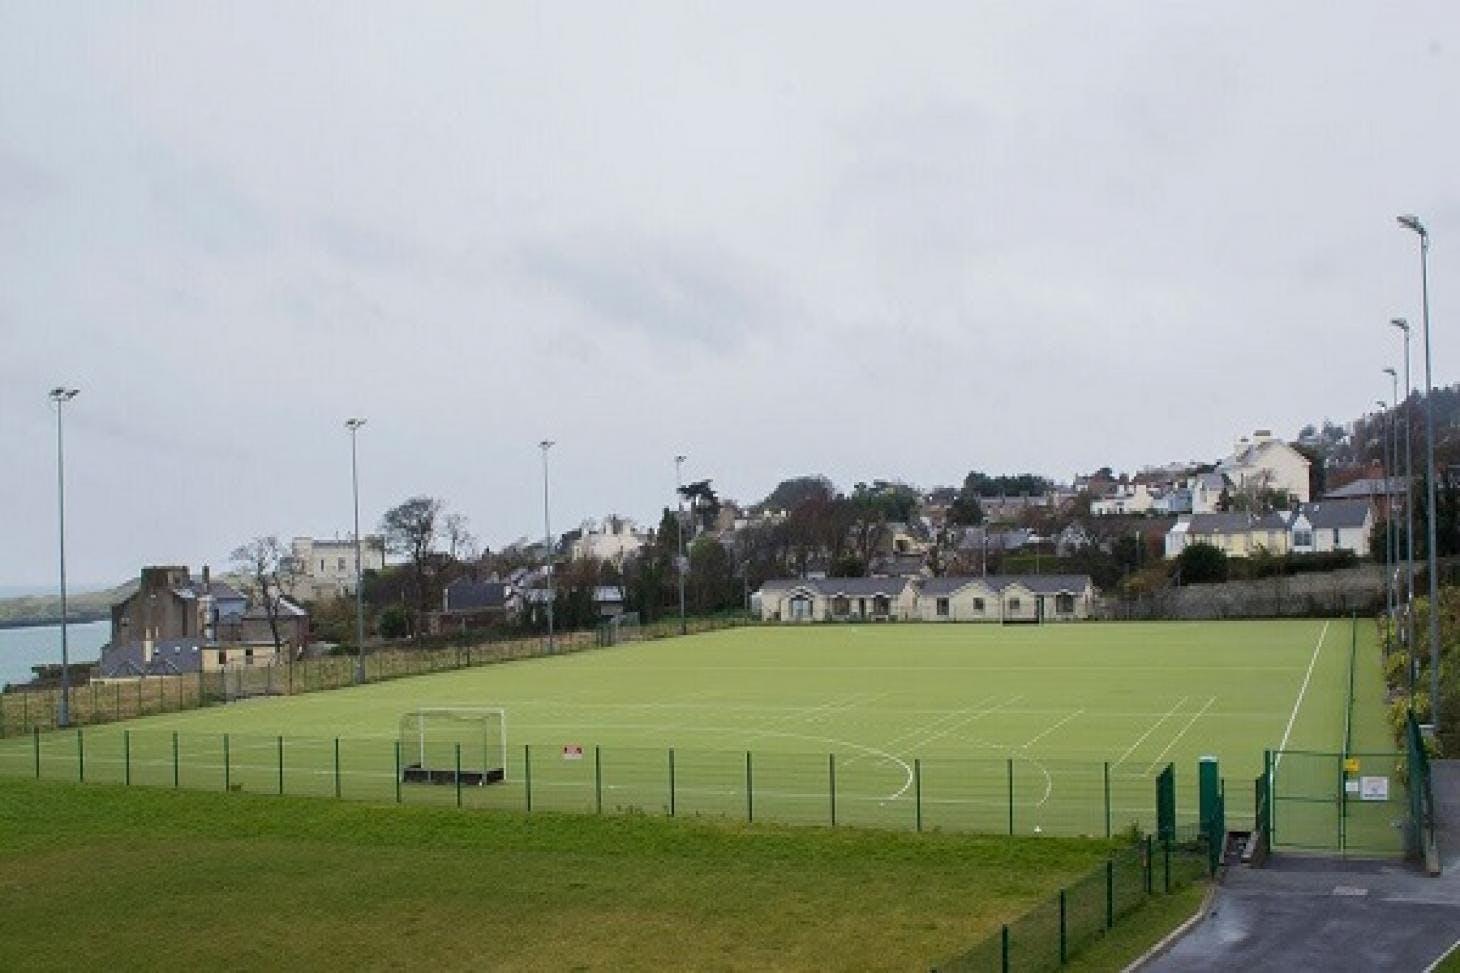 Loreto Abbey Sports Hall 11 a side | Astroturf football pitch